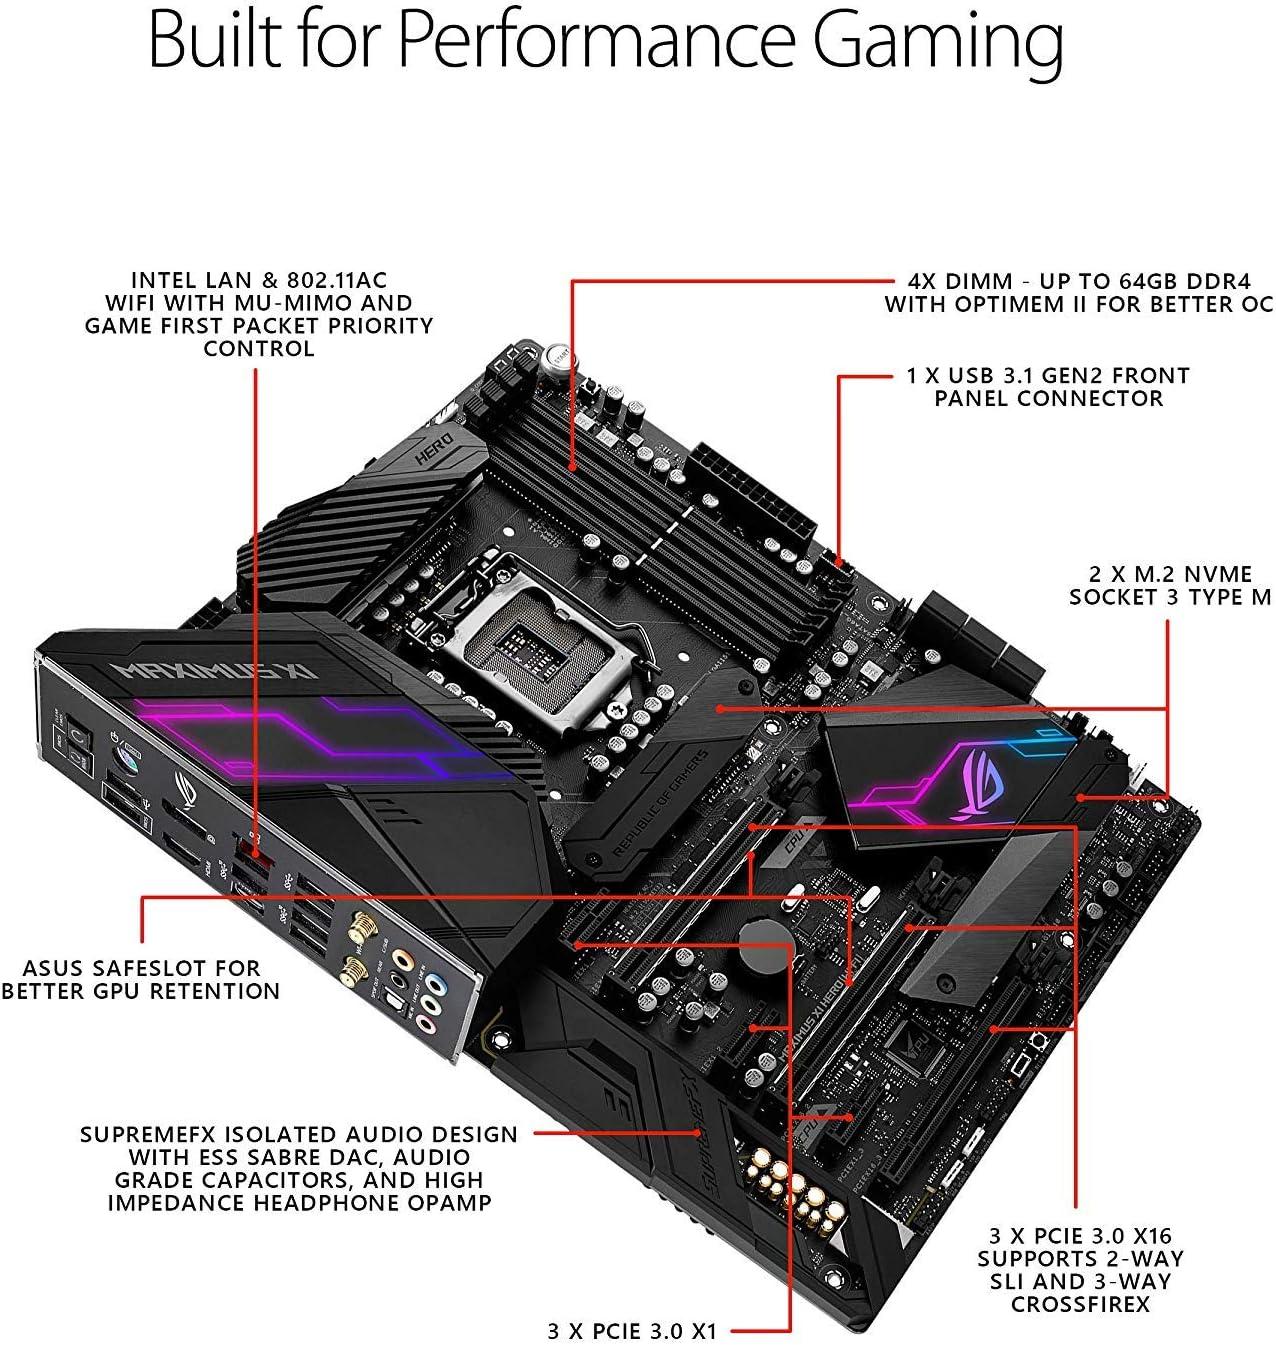 ASUS ROG Maximus XI Hero (Wi-Fi) Z390 Gaming Motherboard